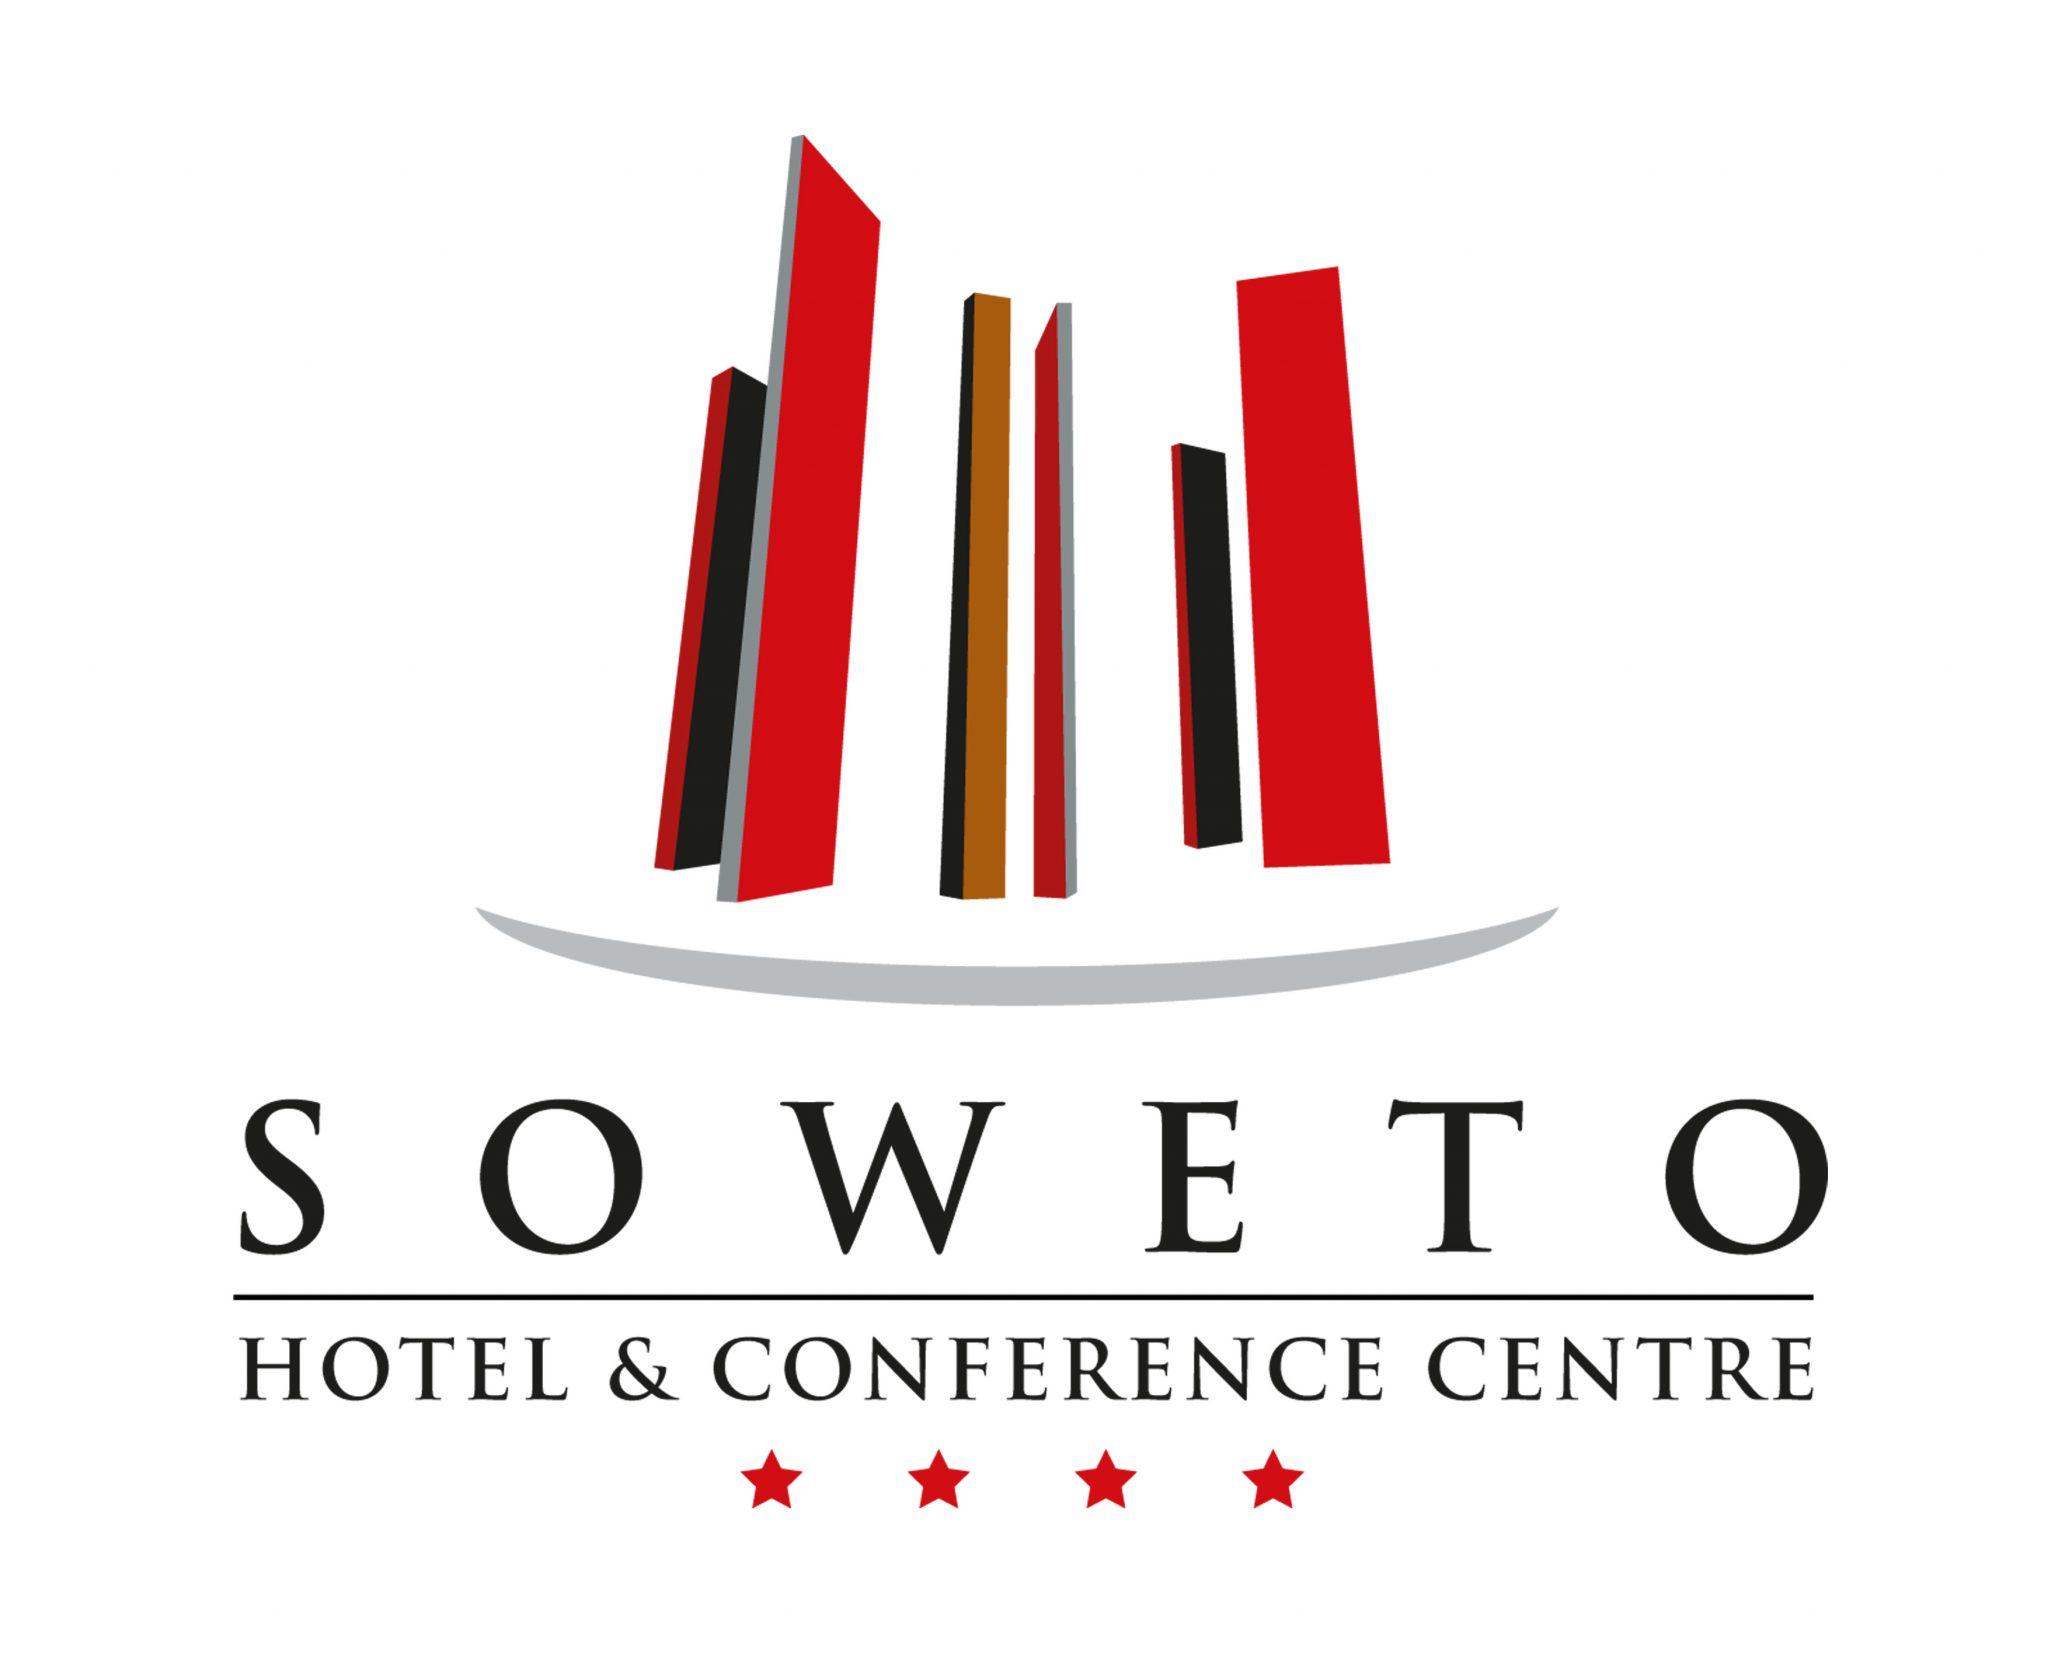 Soweto Hotel Logo